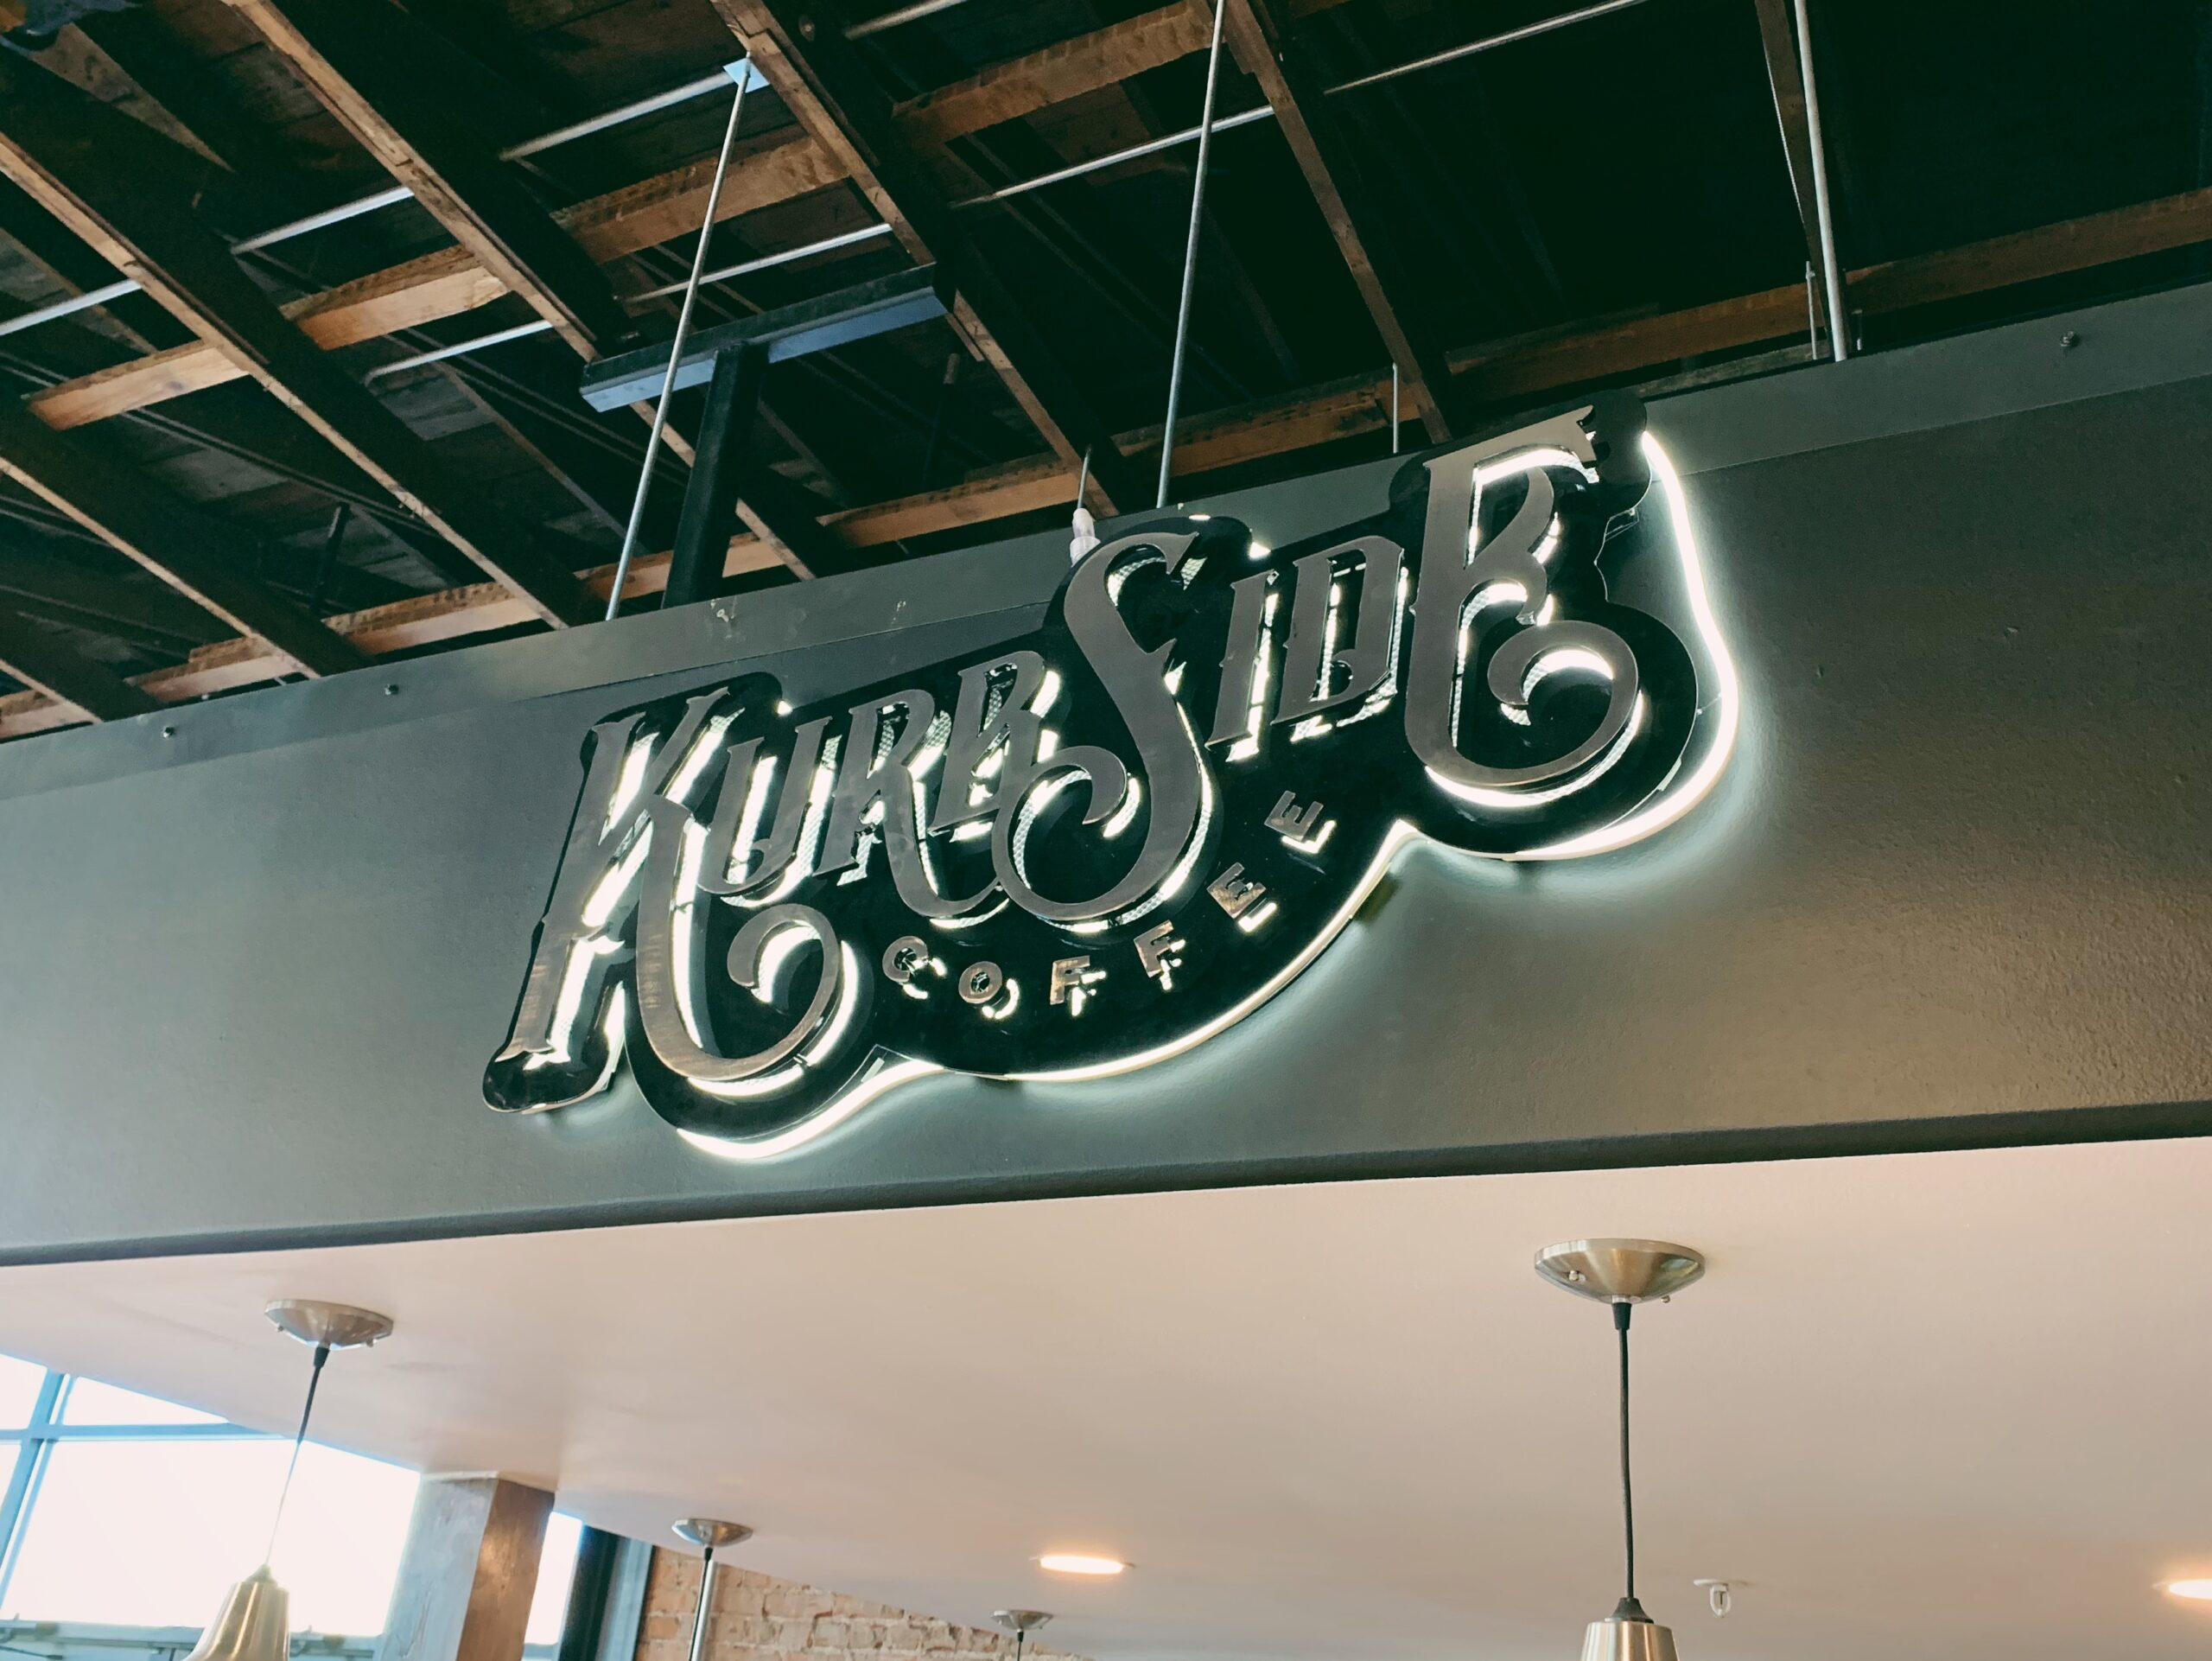 Kurbside Coffee - Union Hall